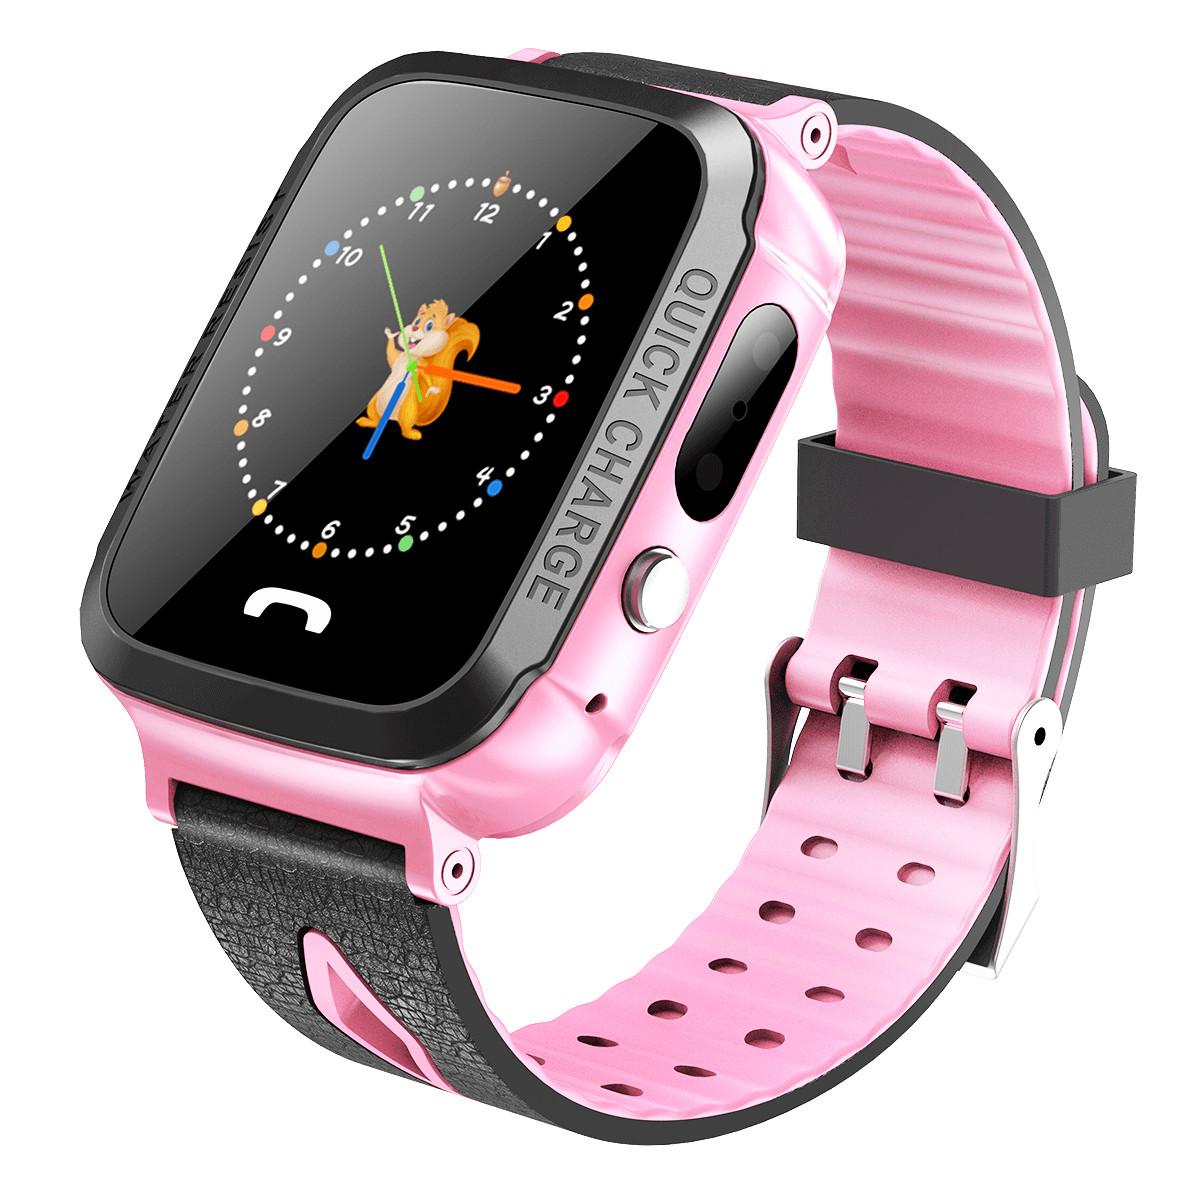 ATOUMUATOUMU儿童电话手表学生GPS双重智能拍照定位防水COLORV5A-移动联通版(粉色)